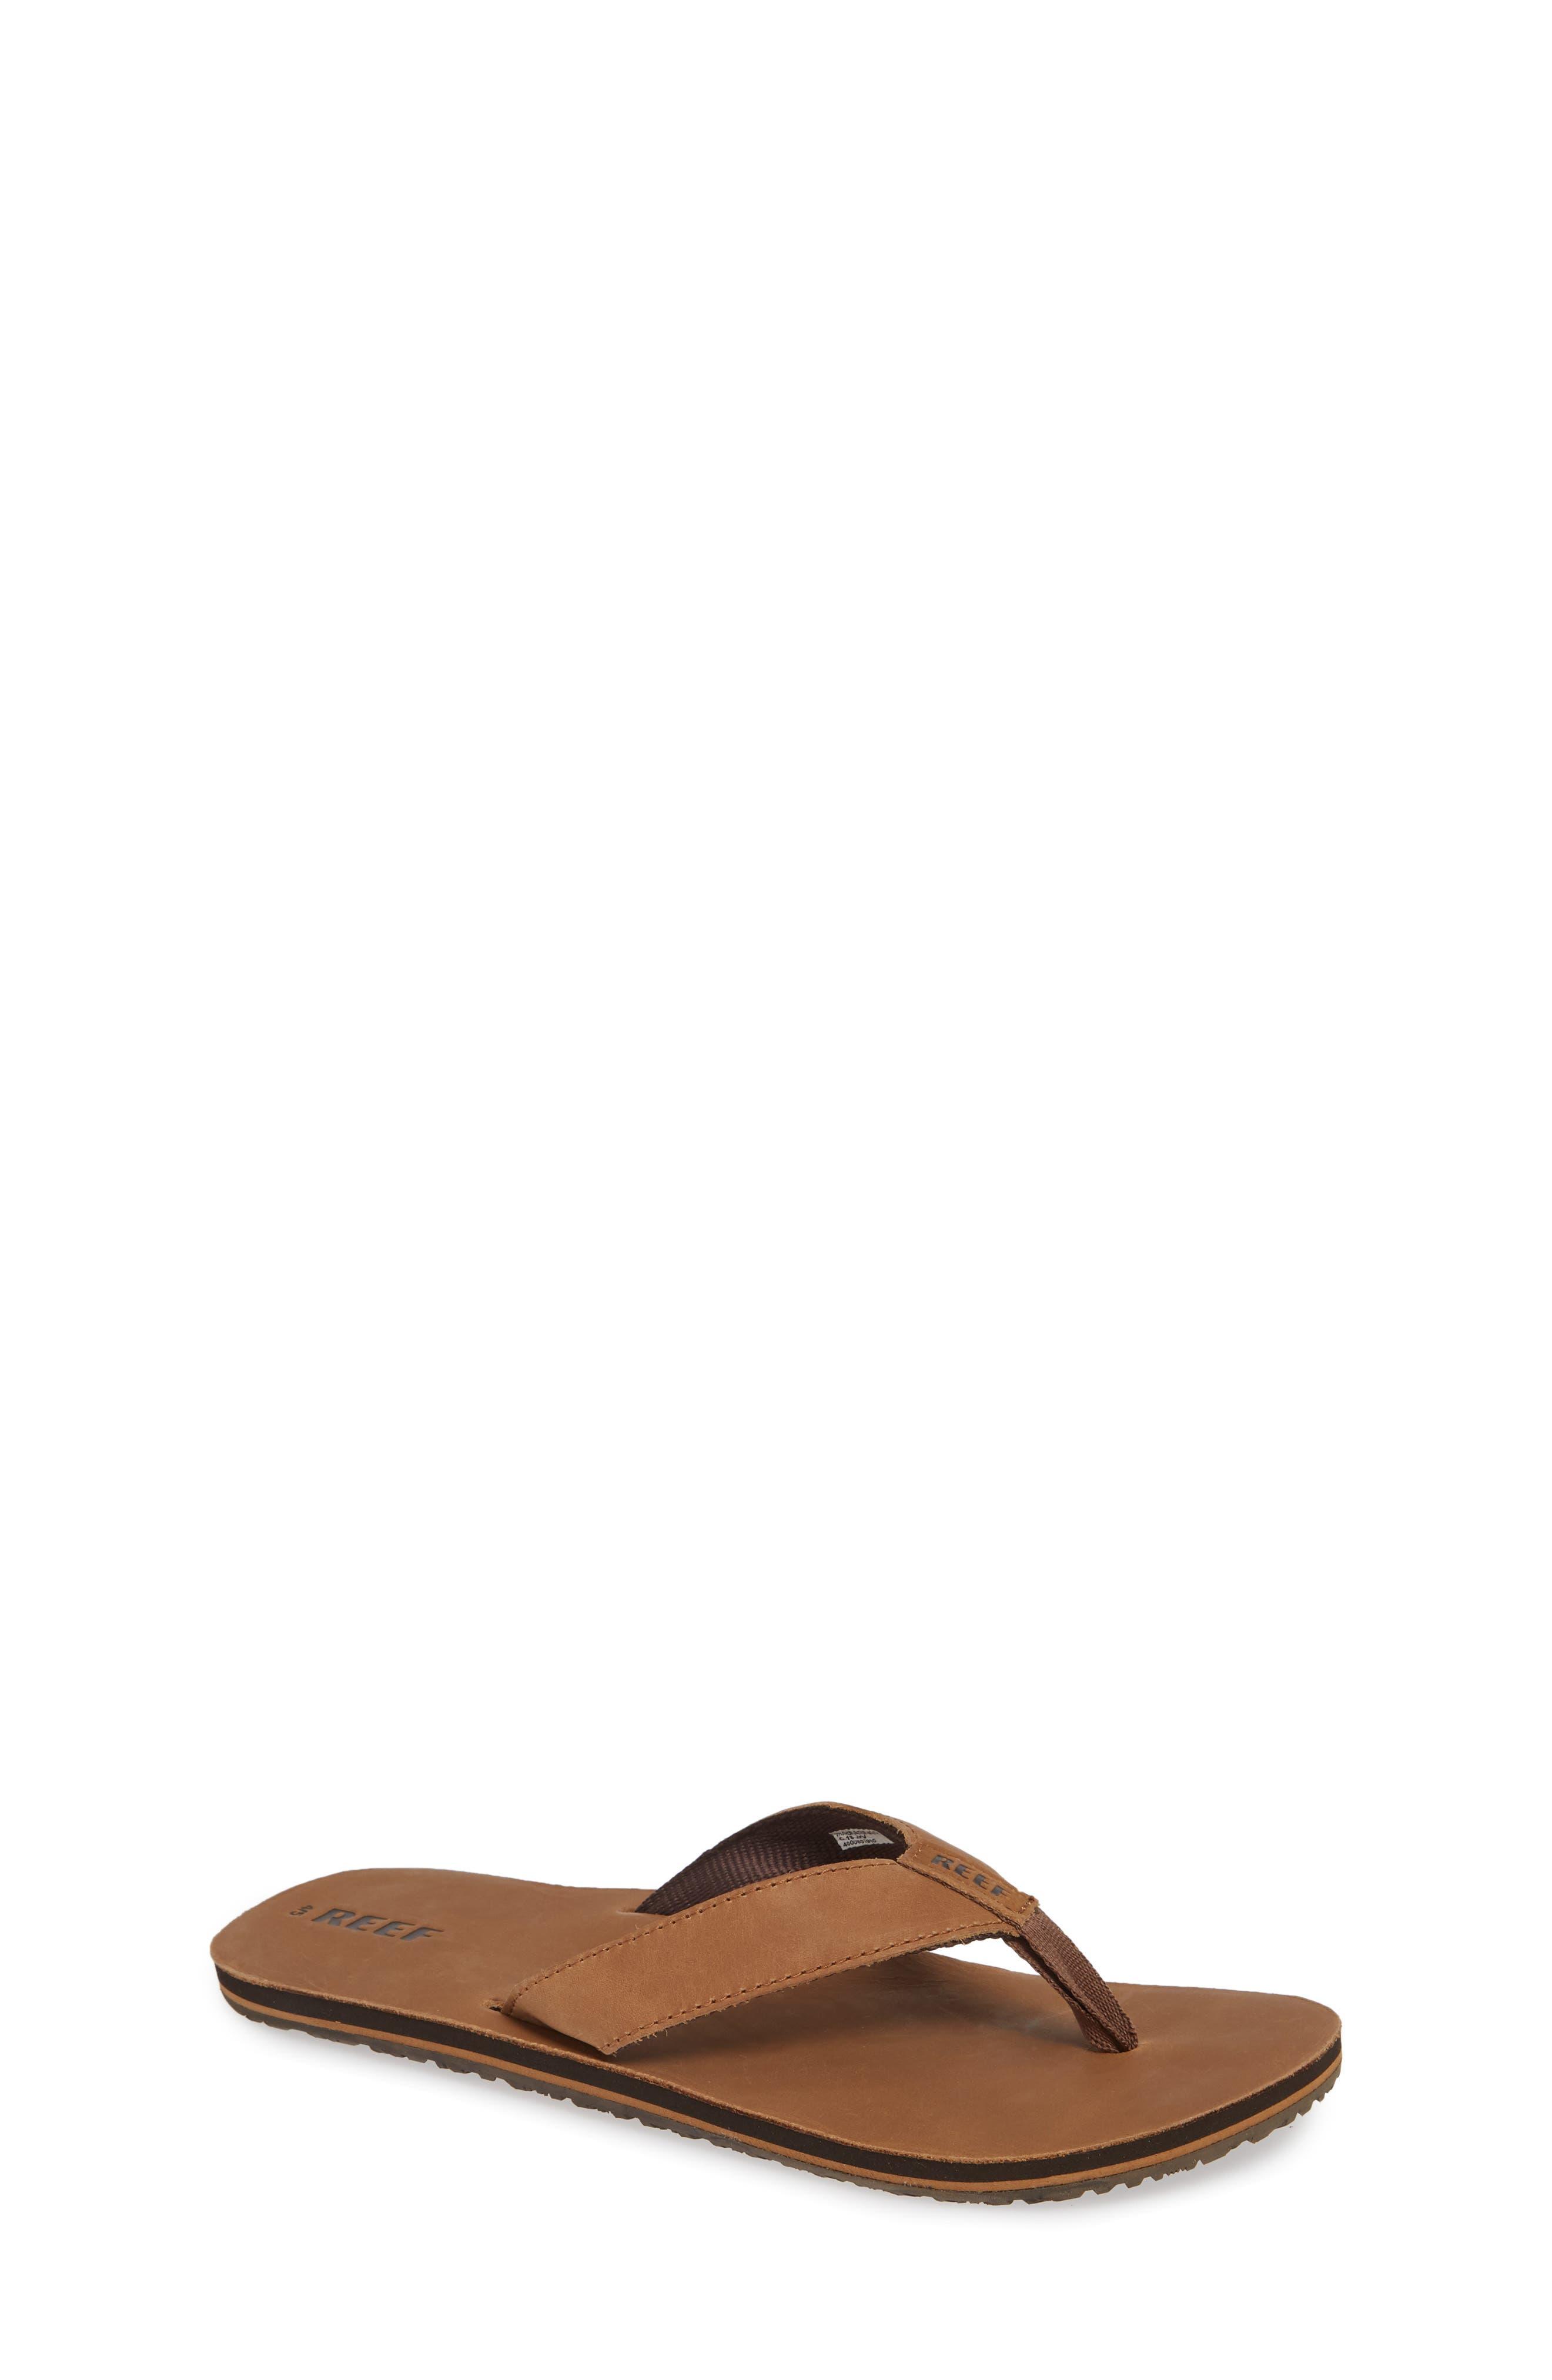 'Grom' Leather Flip-Flop,                         Main,                         color, 200